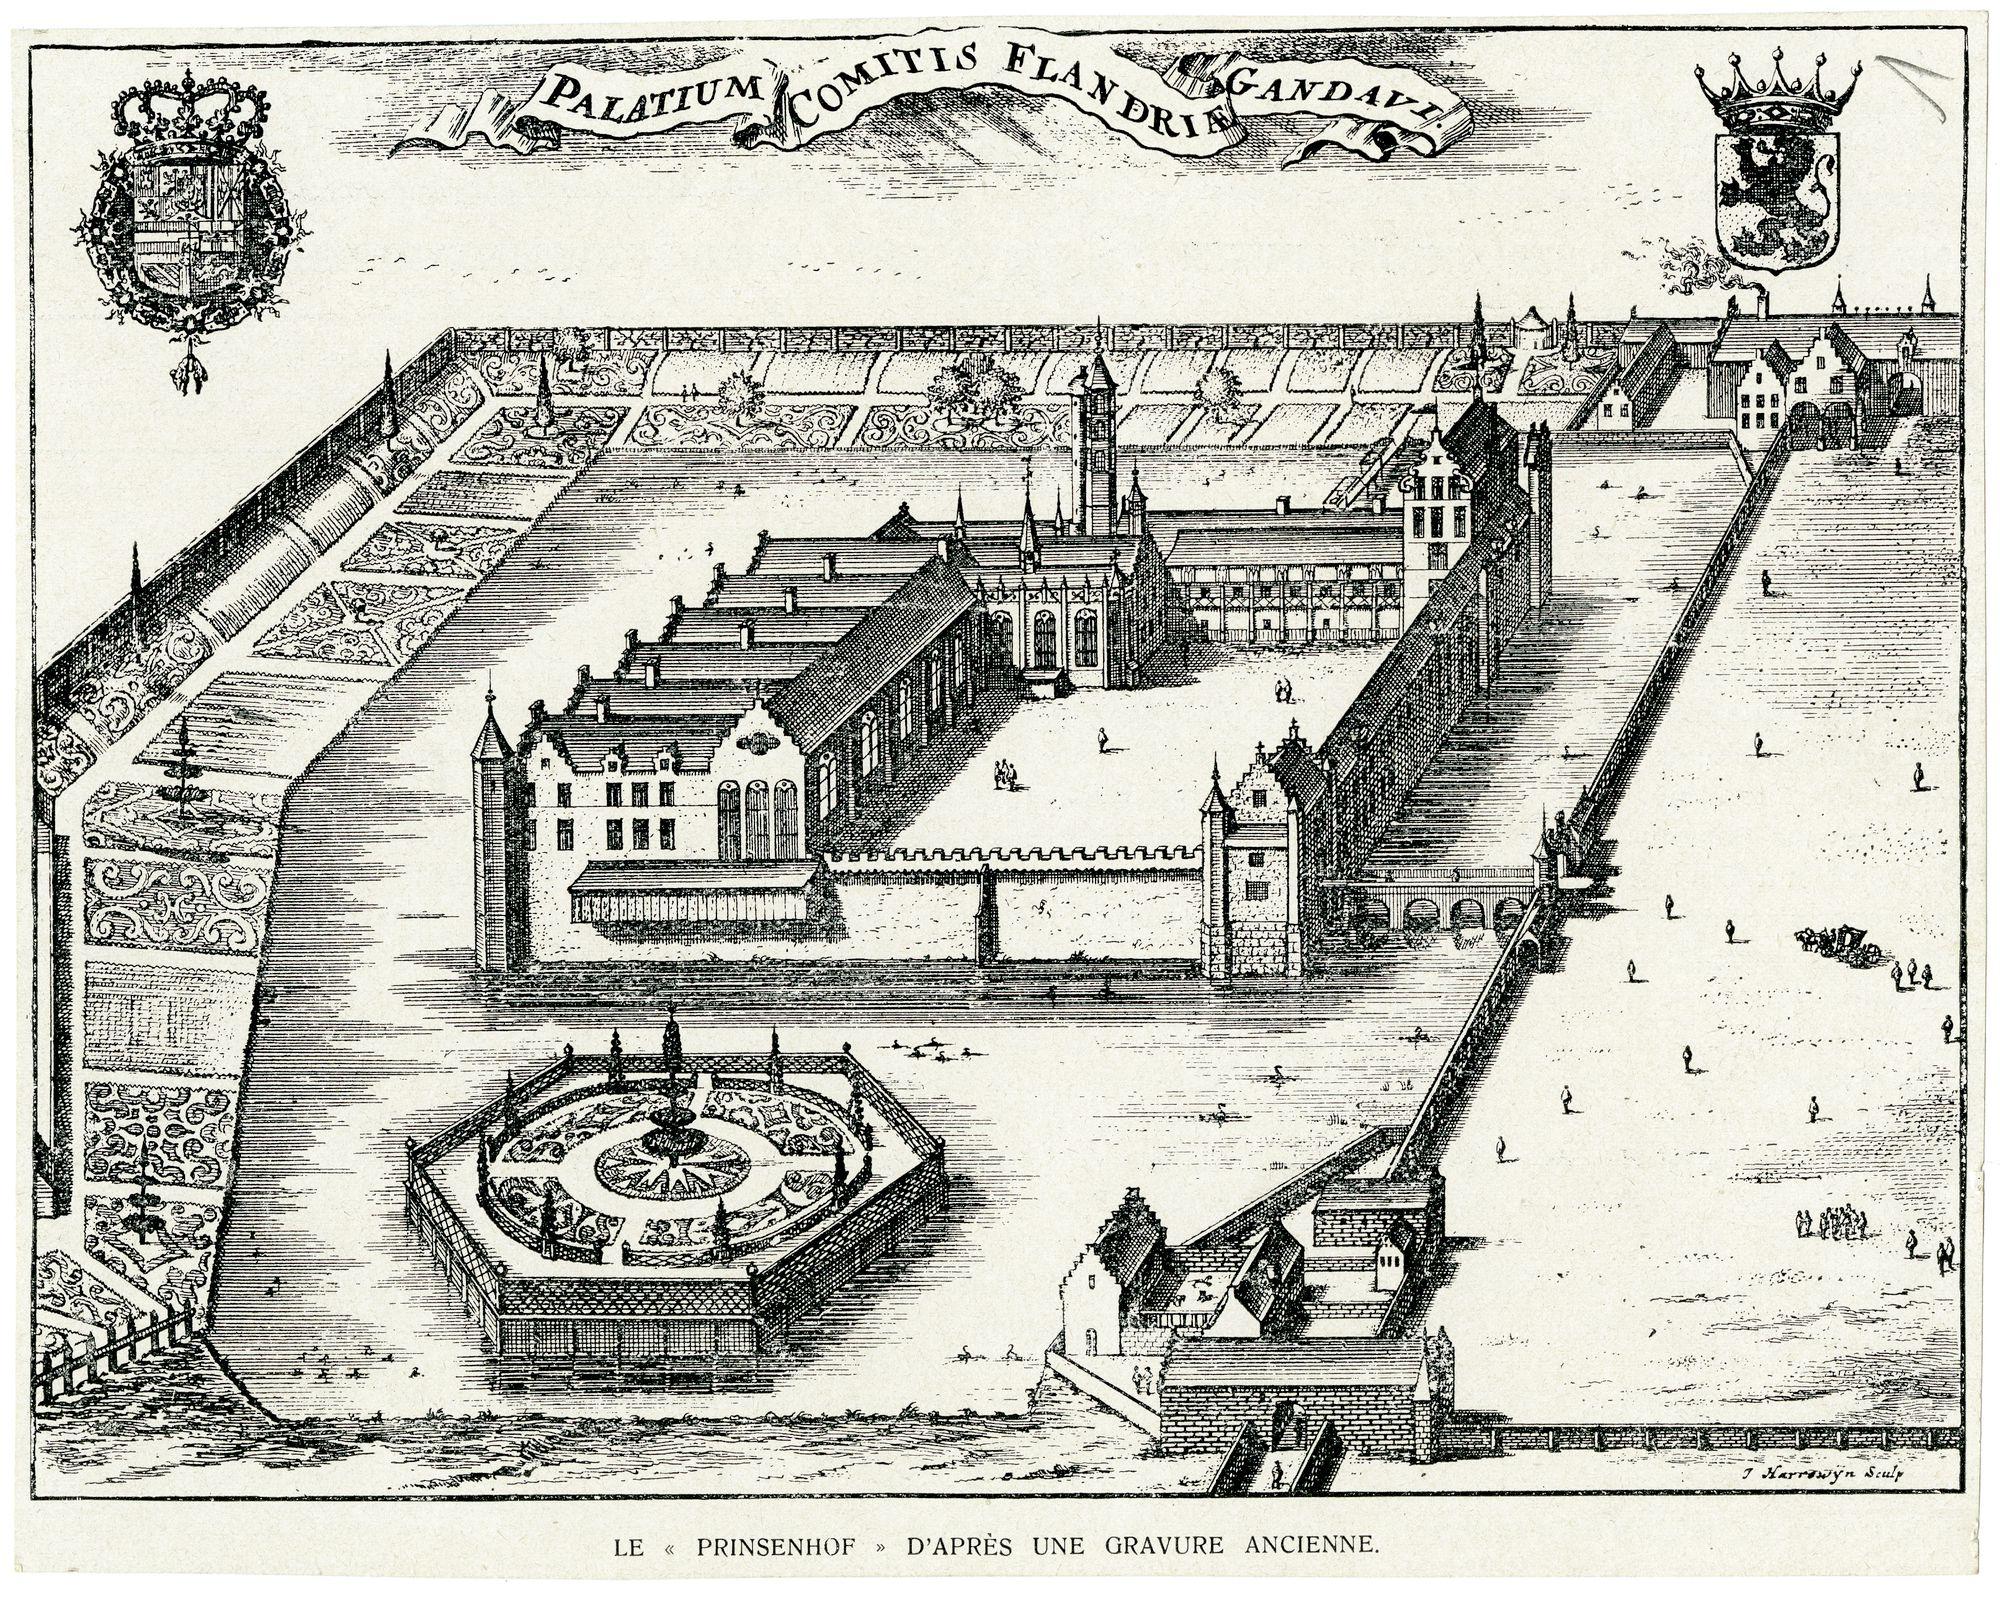 Gent: Prinsenhof